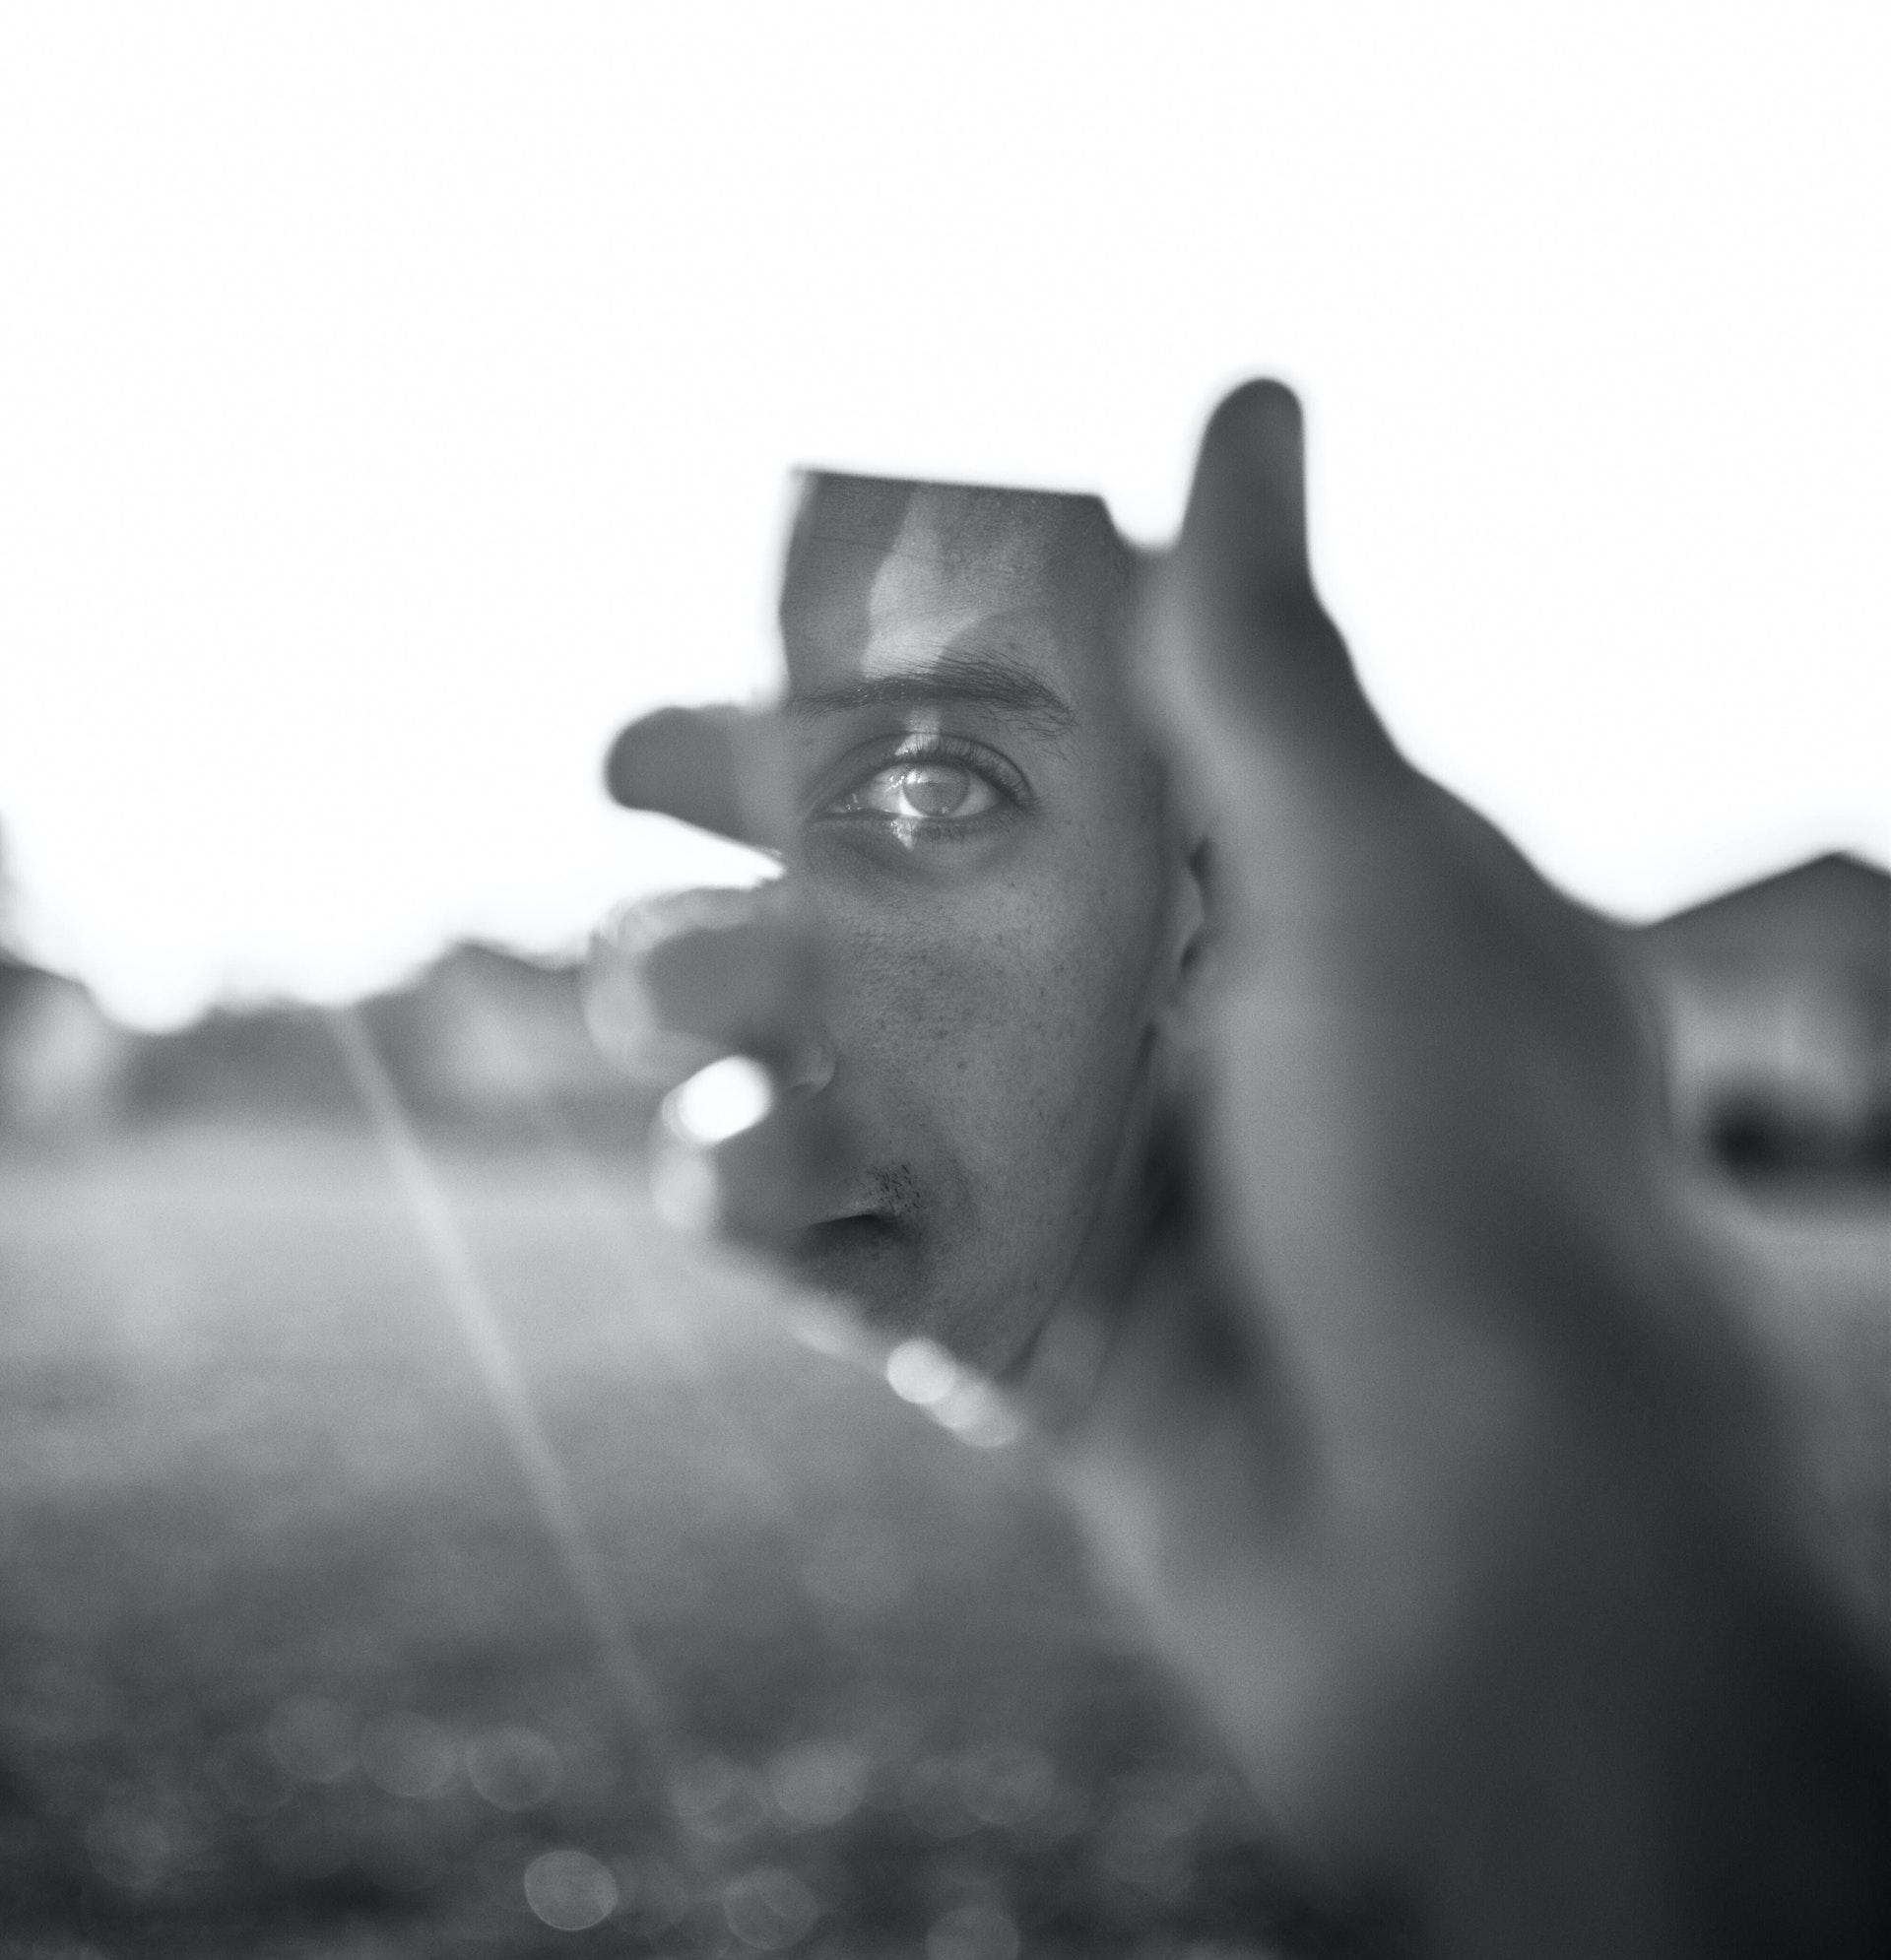 Grayscale Photo of Human Hand